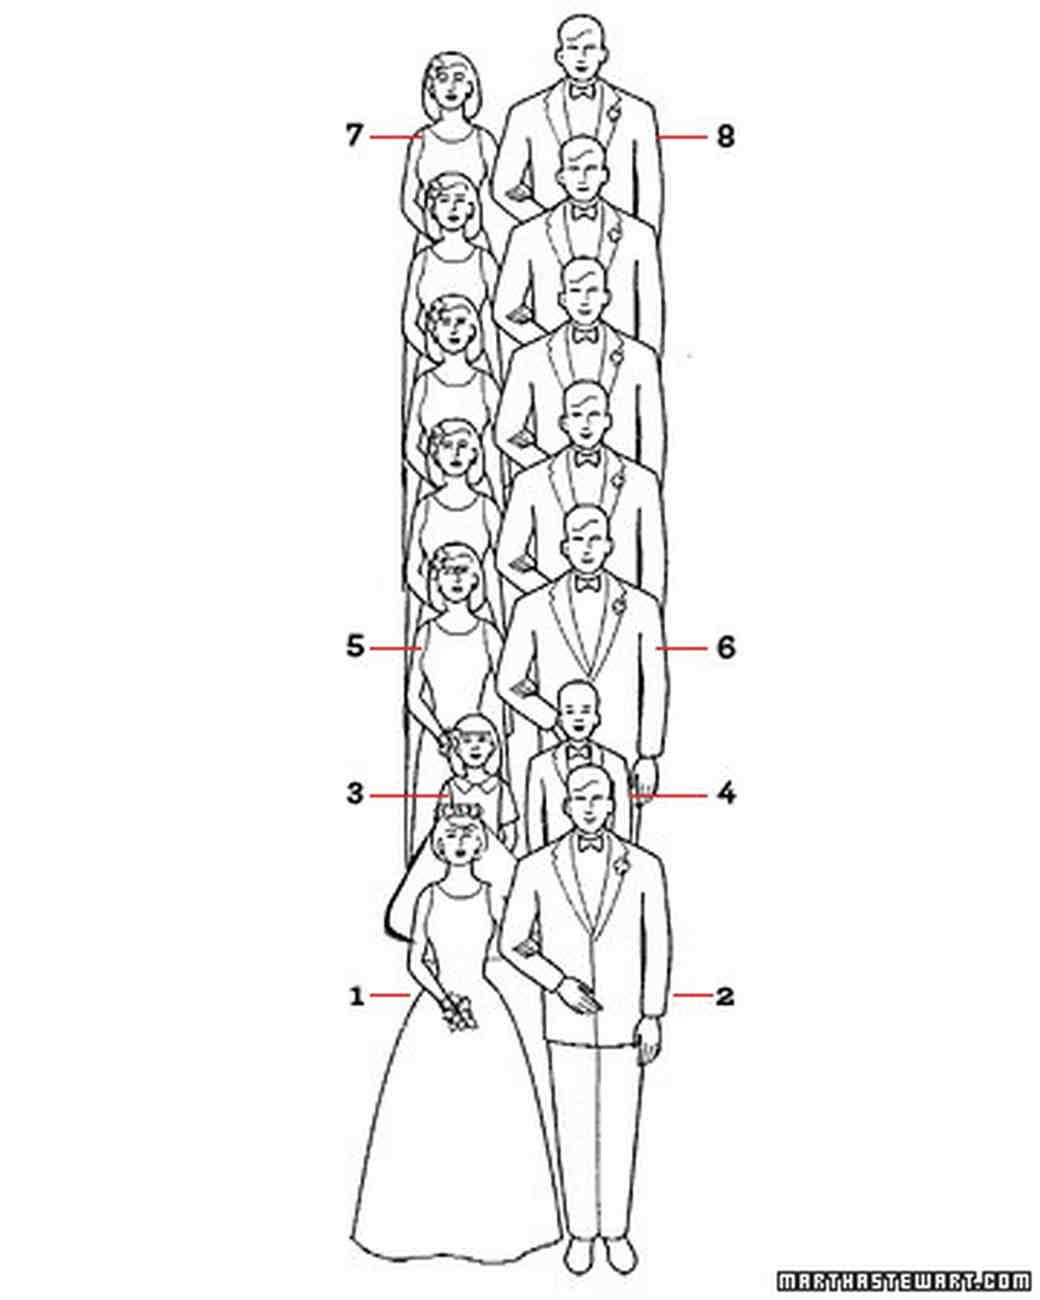 wa_win98_recessionc_xl?itok=KDKCtE7A diagram your big day christian wedding ceremony basics martha